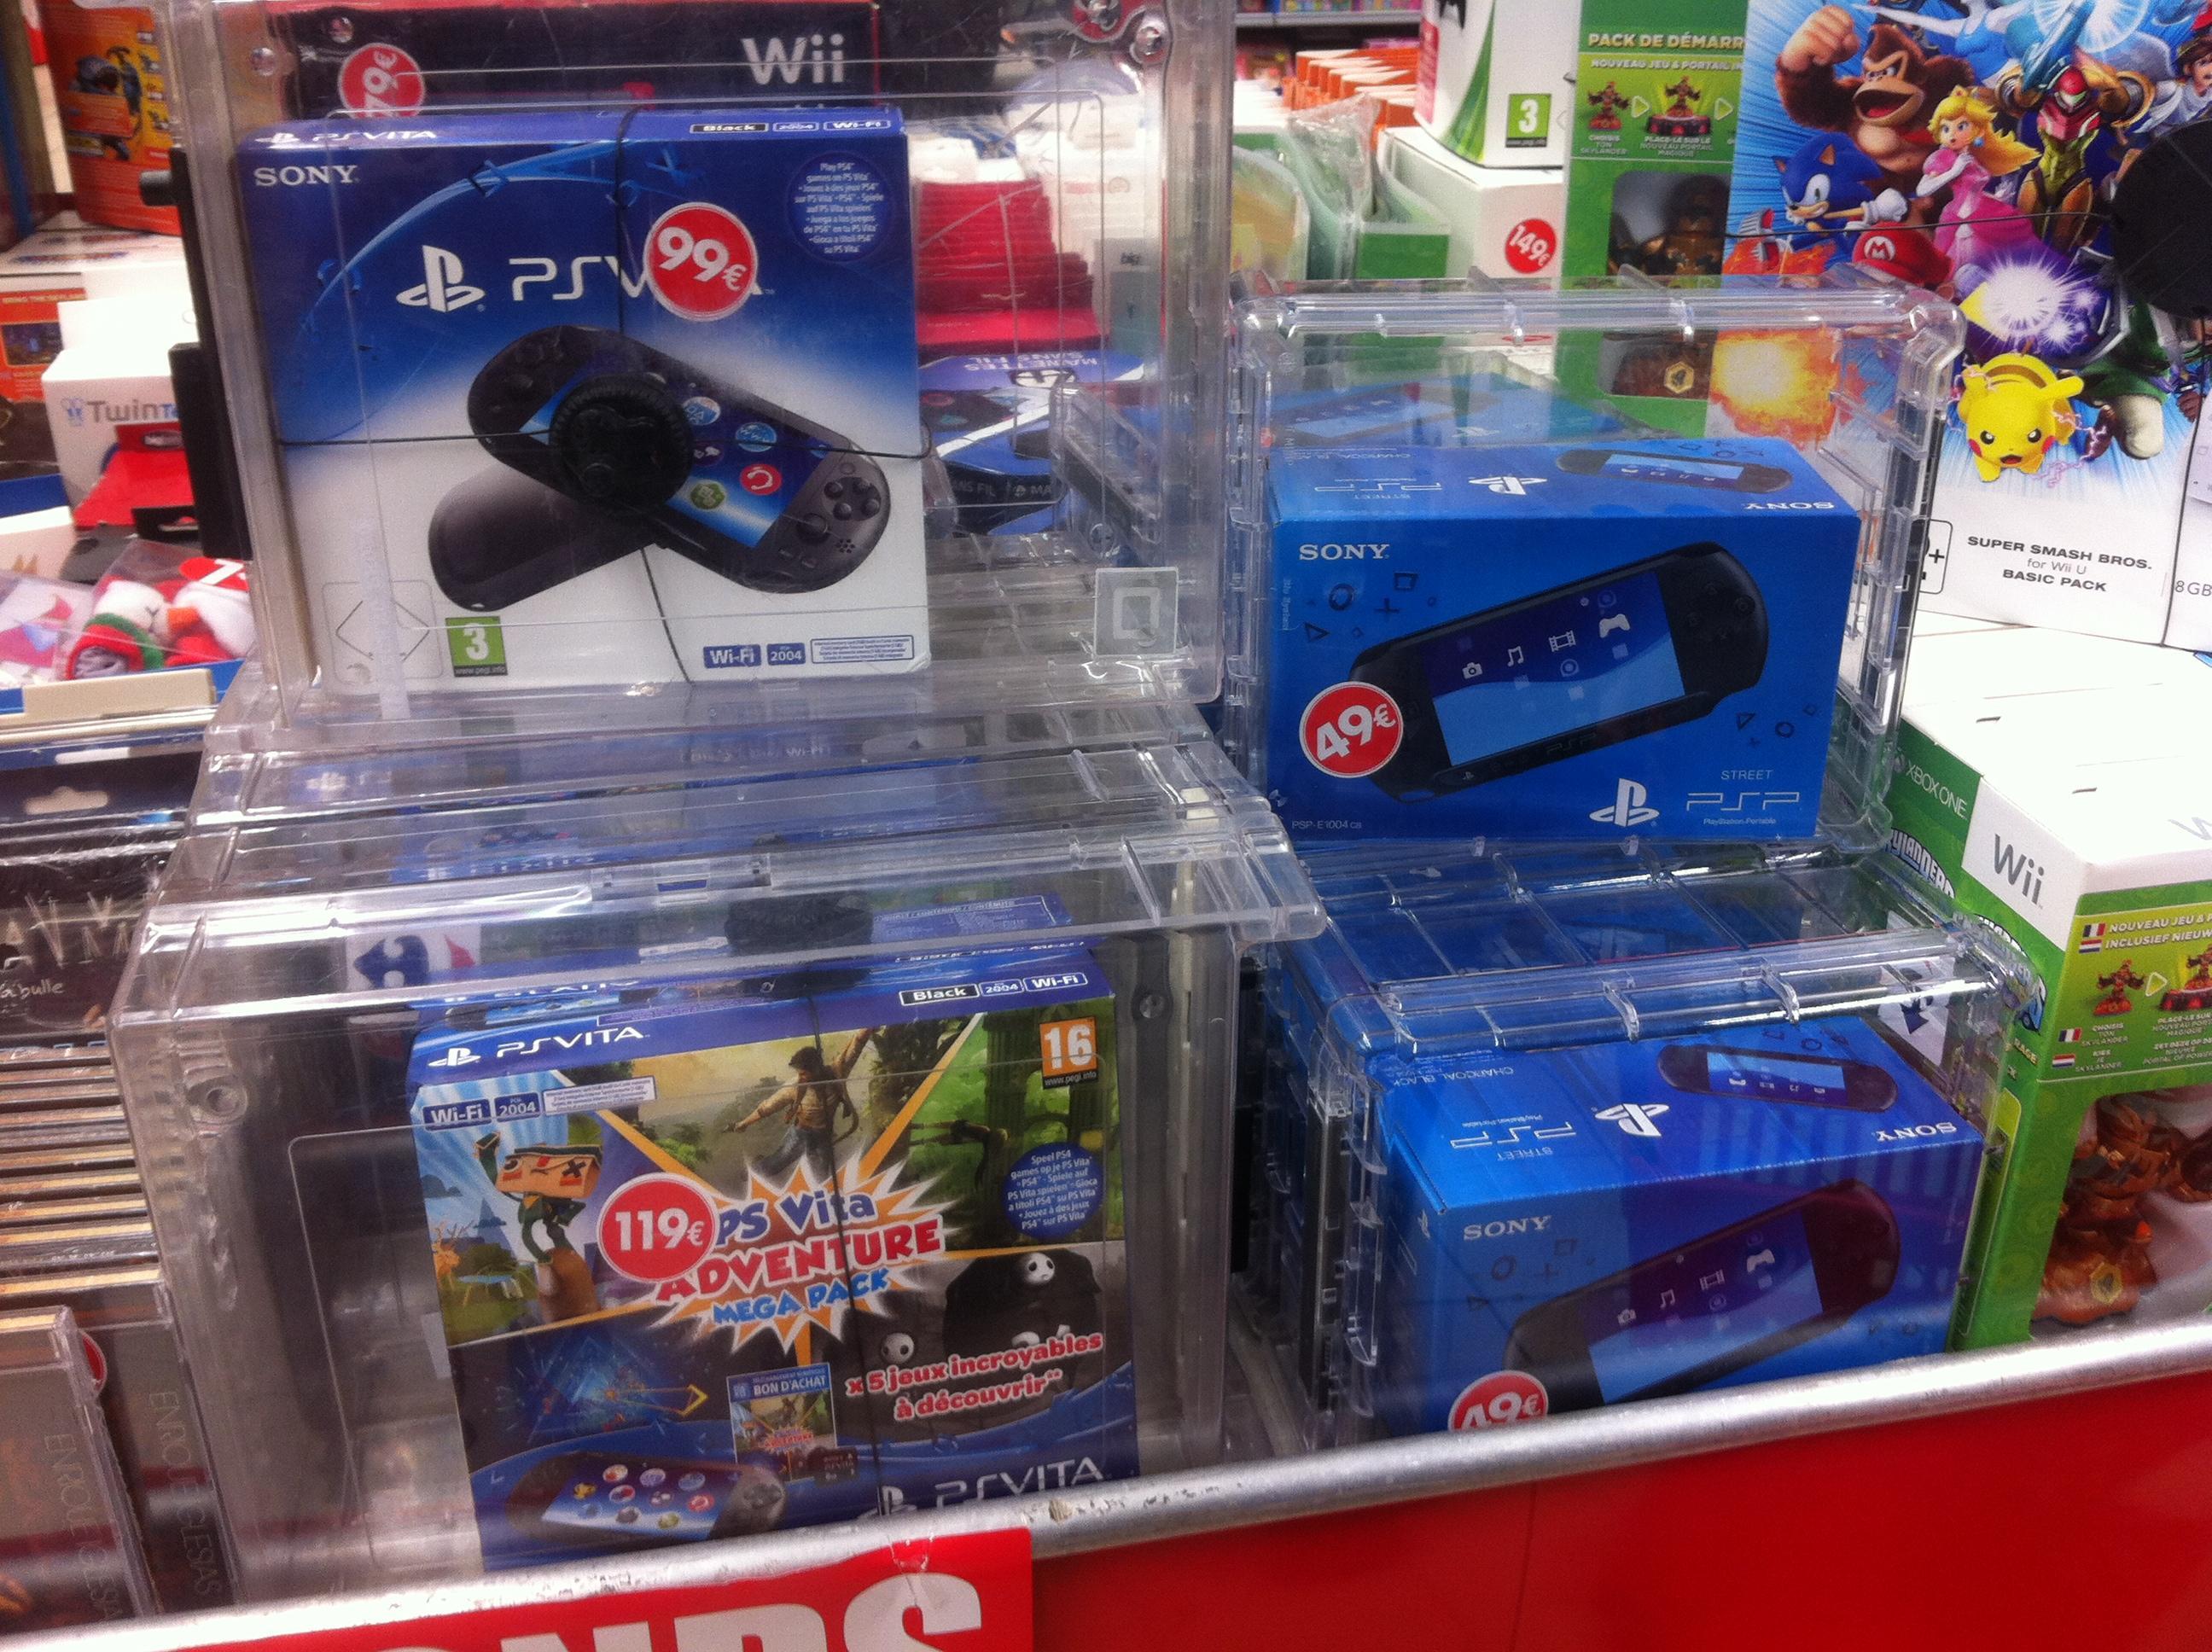 Console PS Vita à 99€ et PSP Street